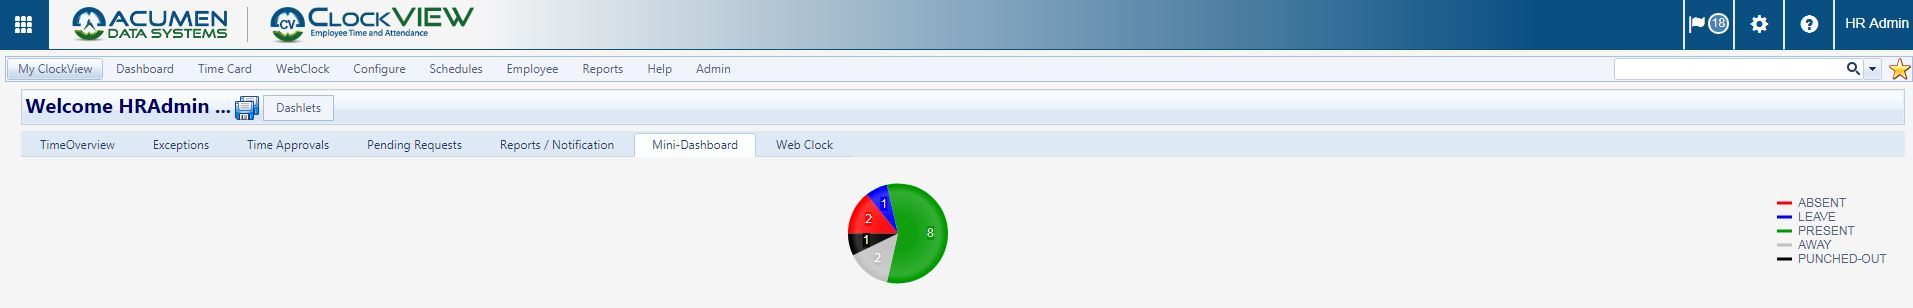 ClockVIEW mini-dashboard